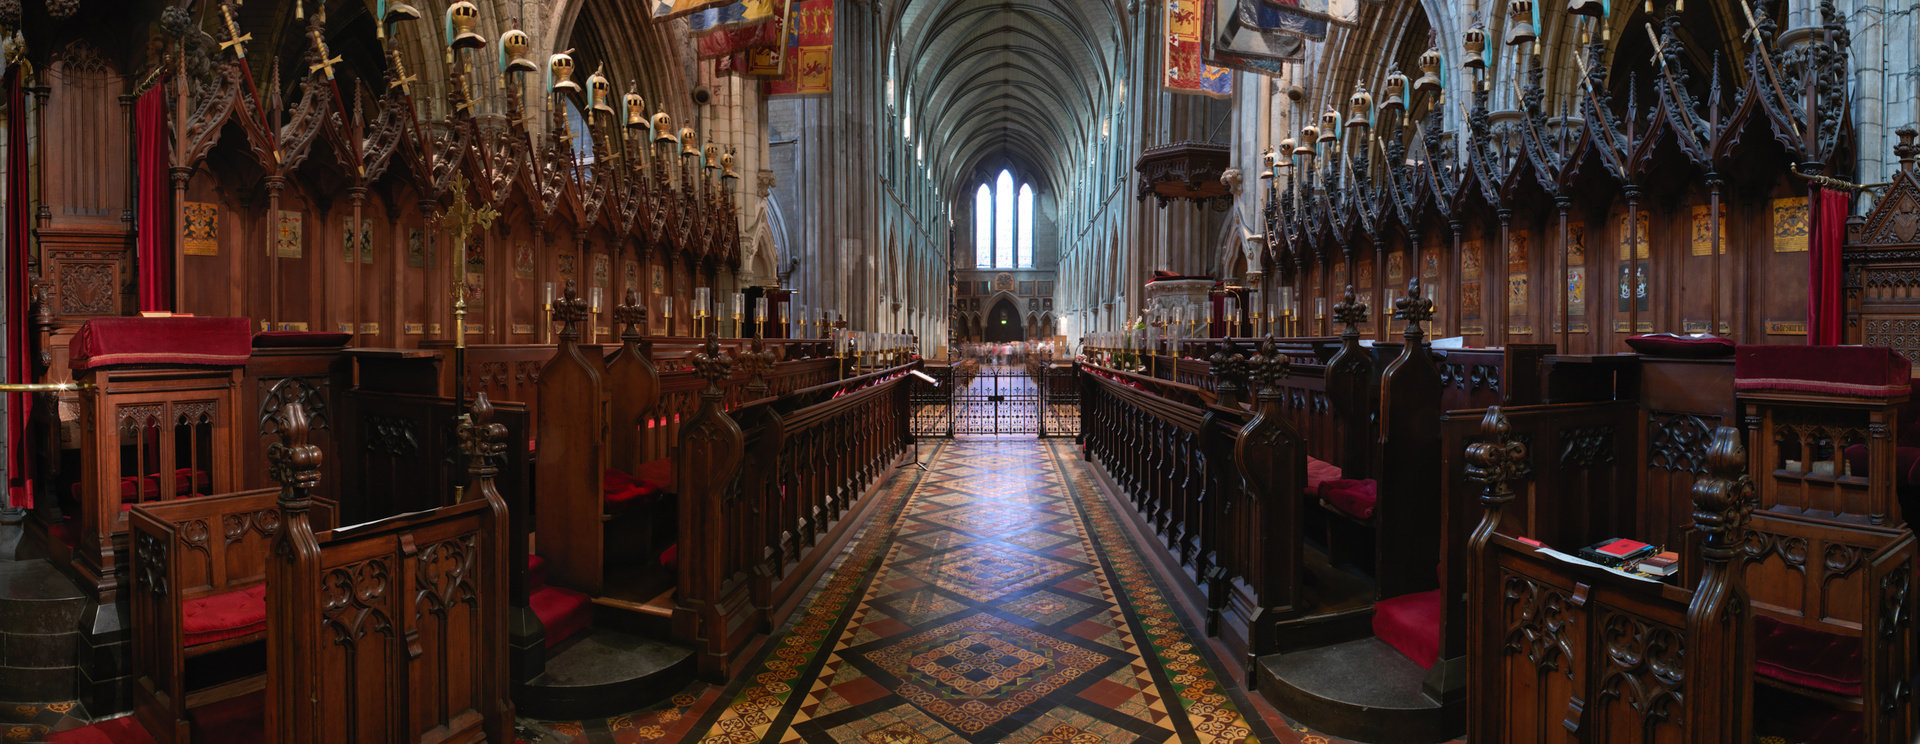 choir stalls-1.jpg